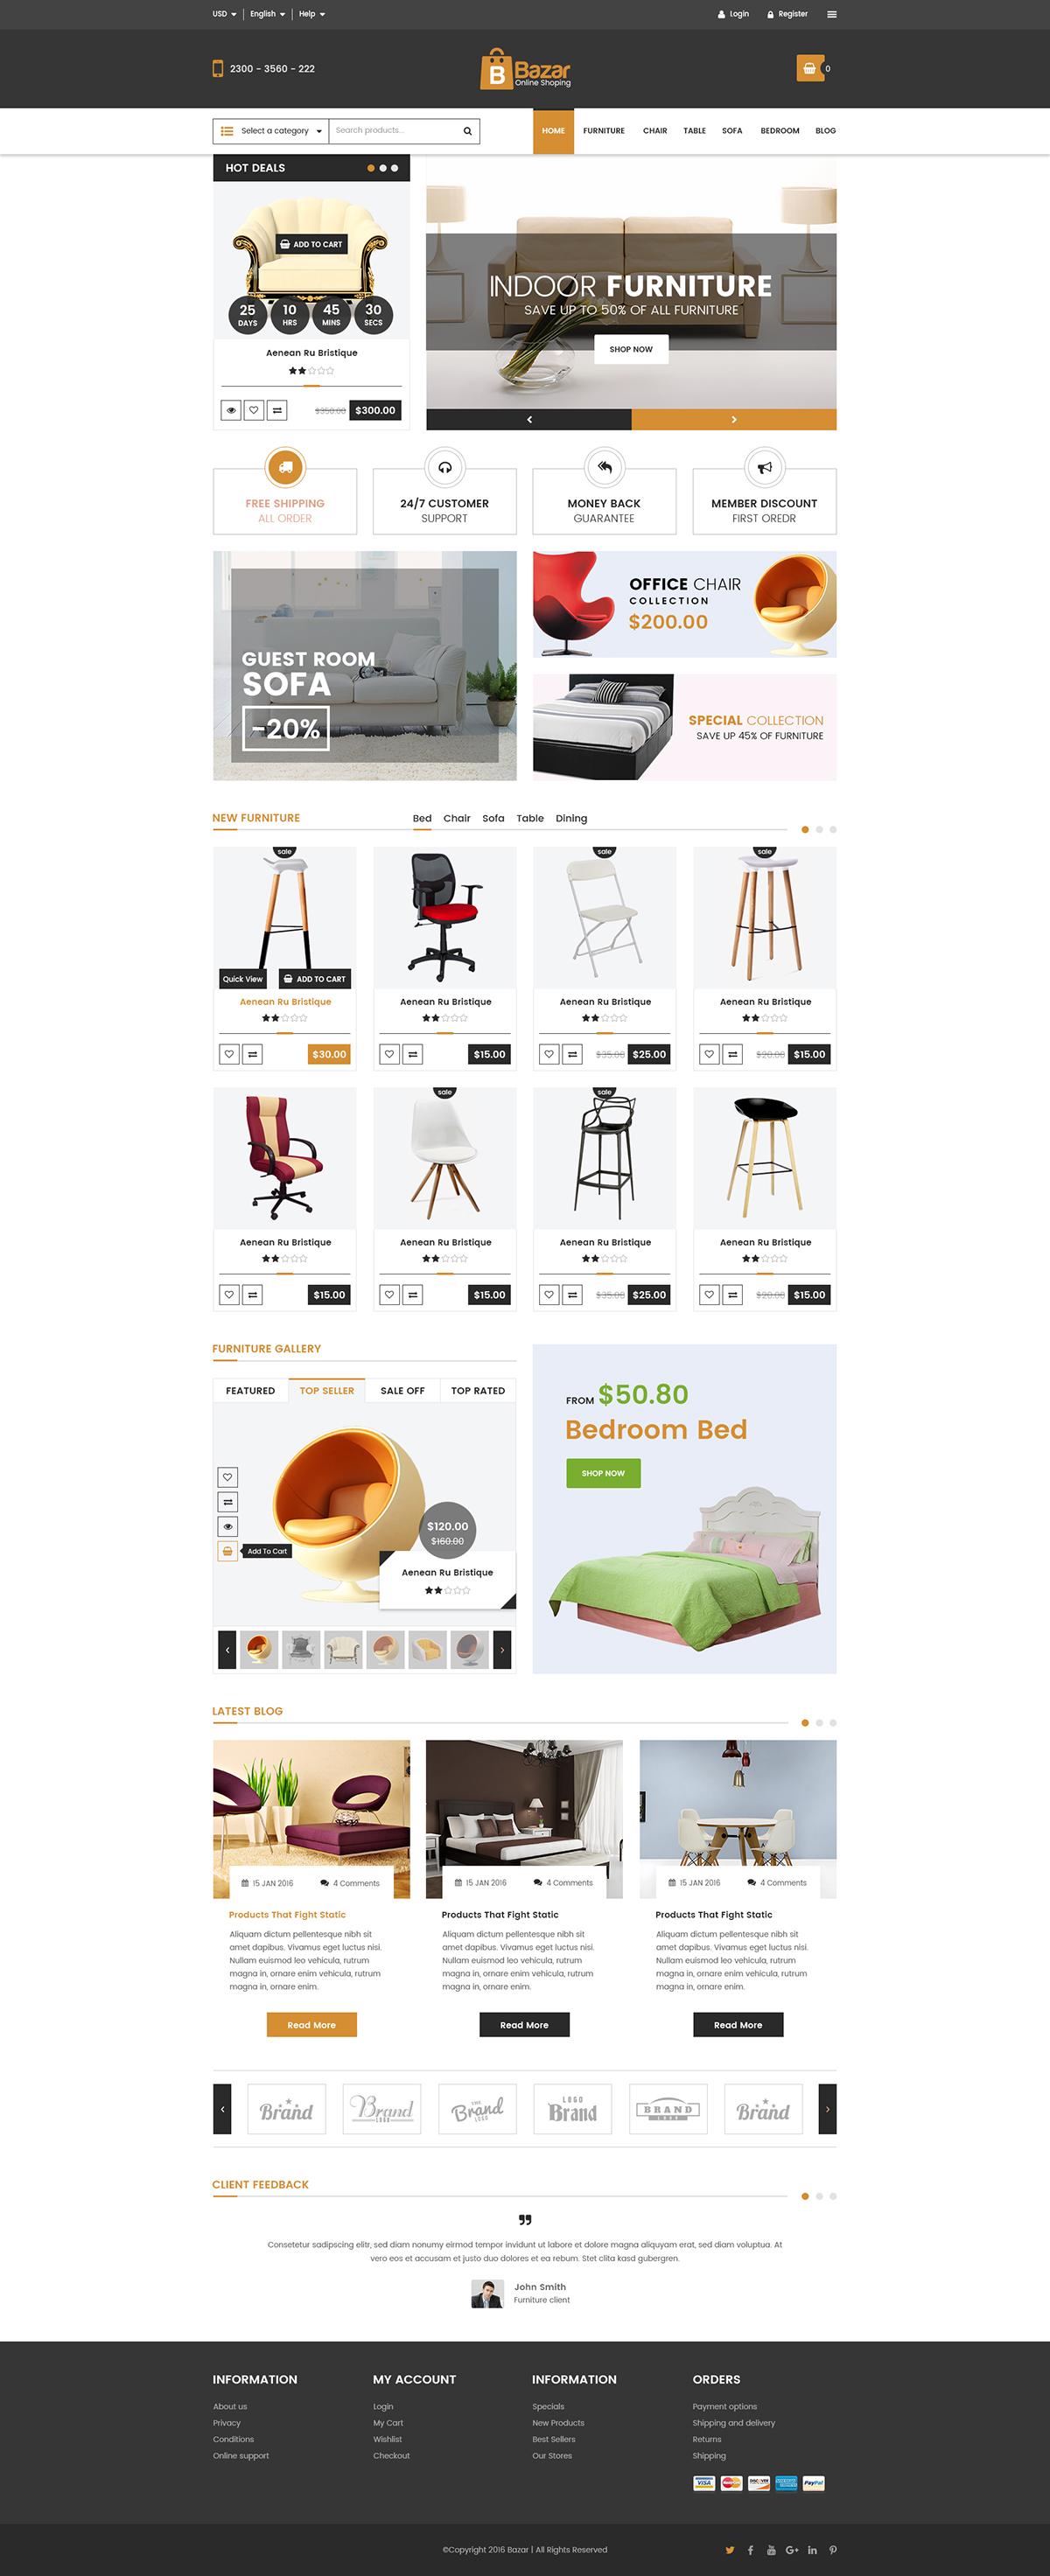 Bazar E-Commerce Free PSD Template on Behance